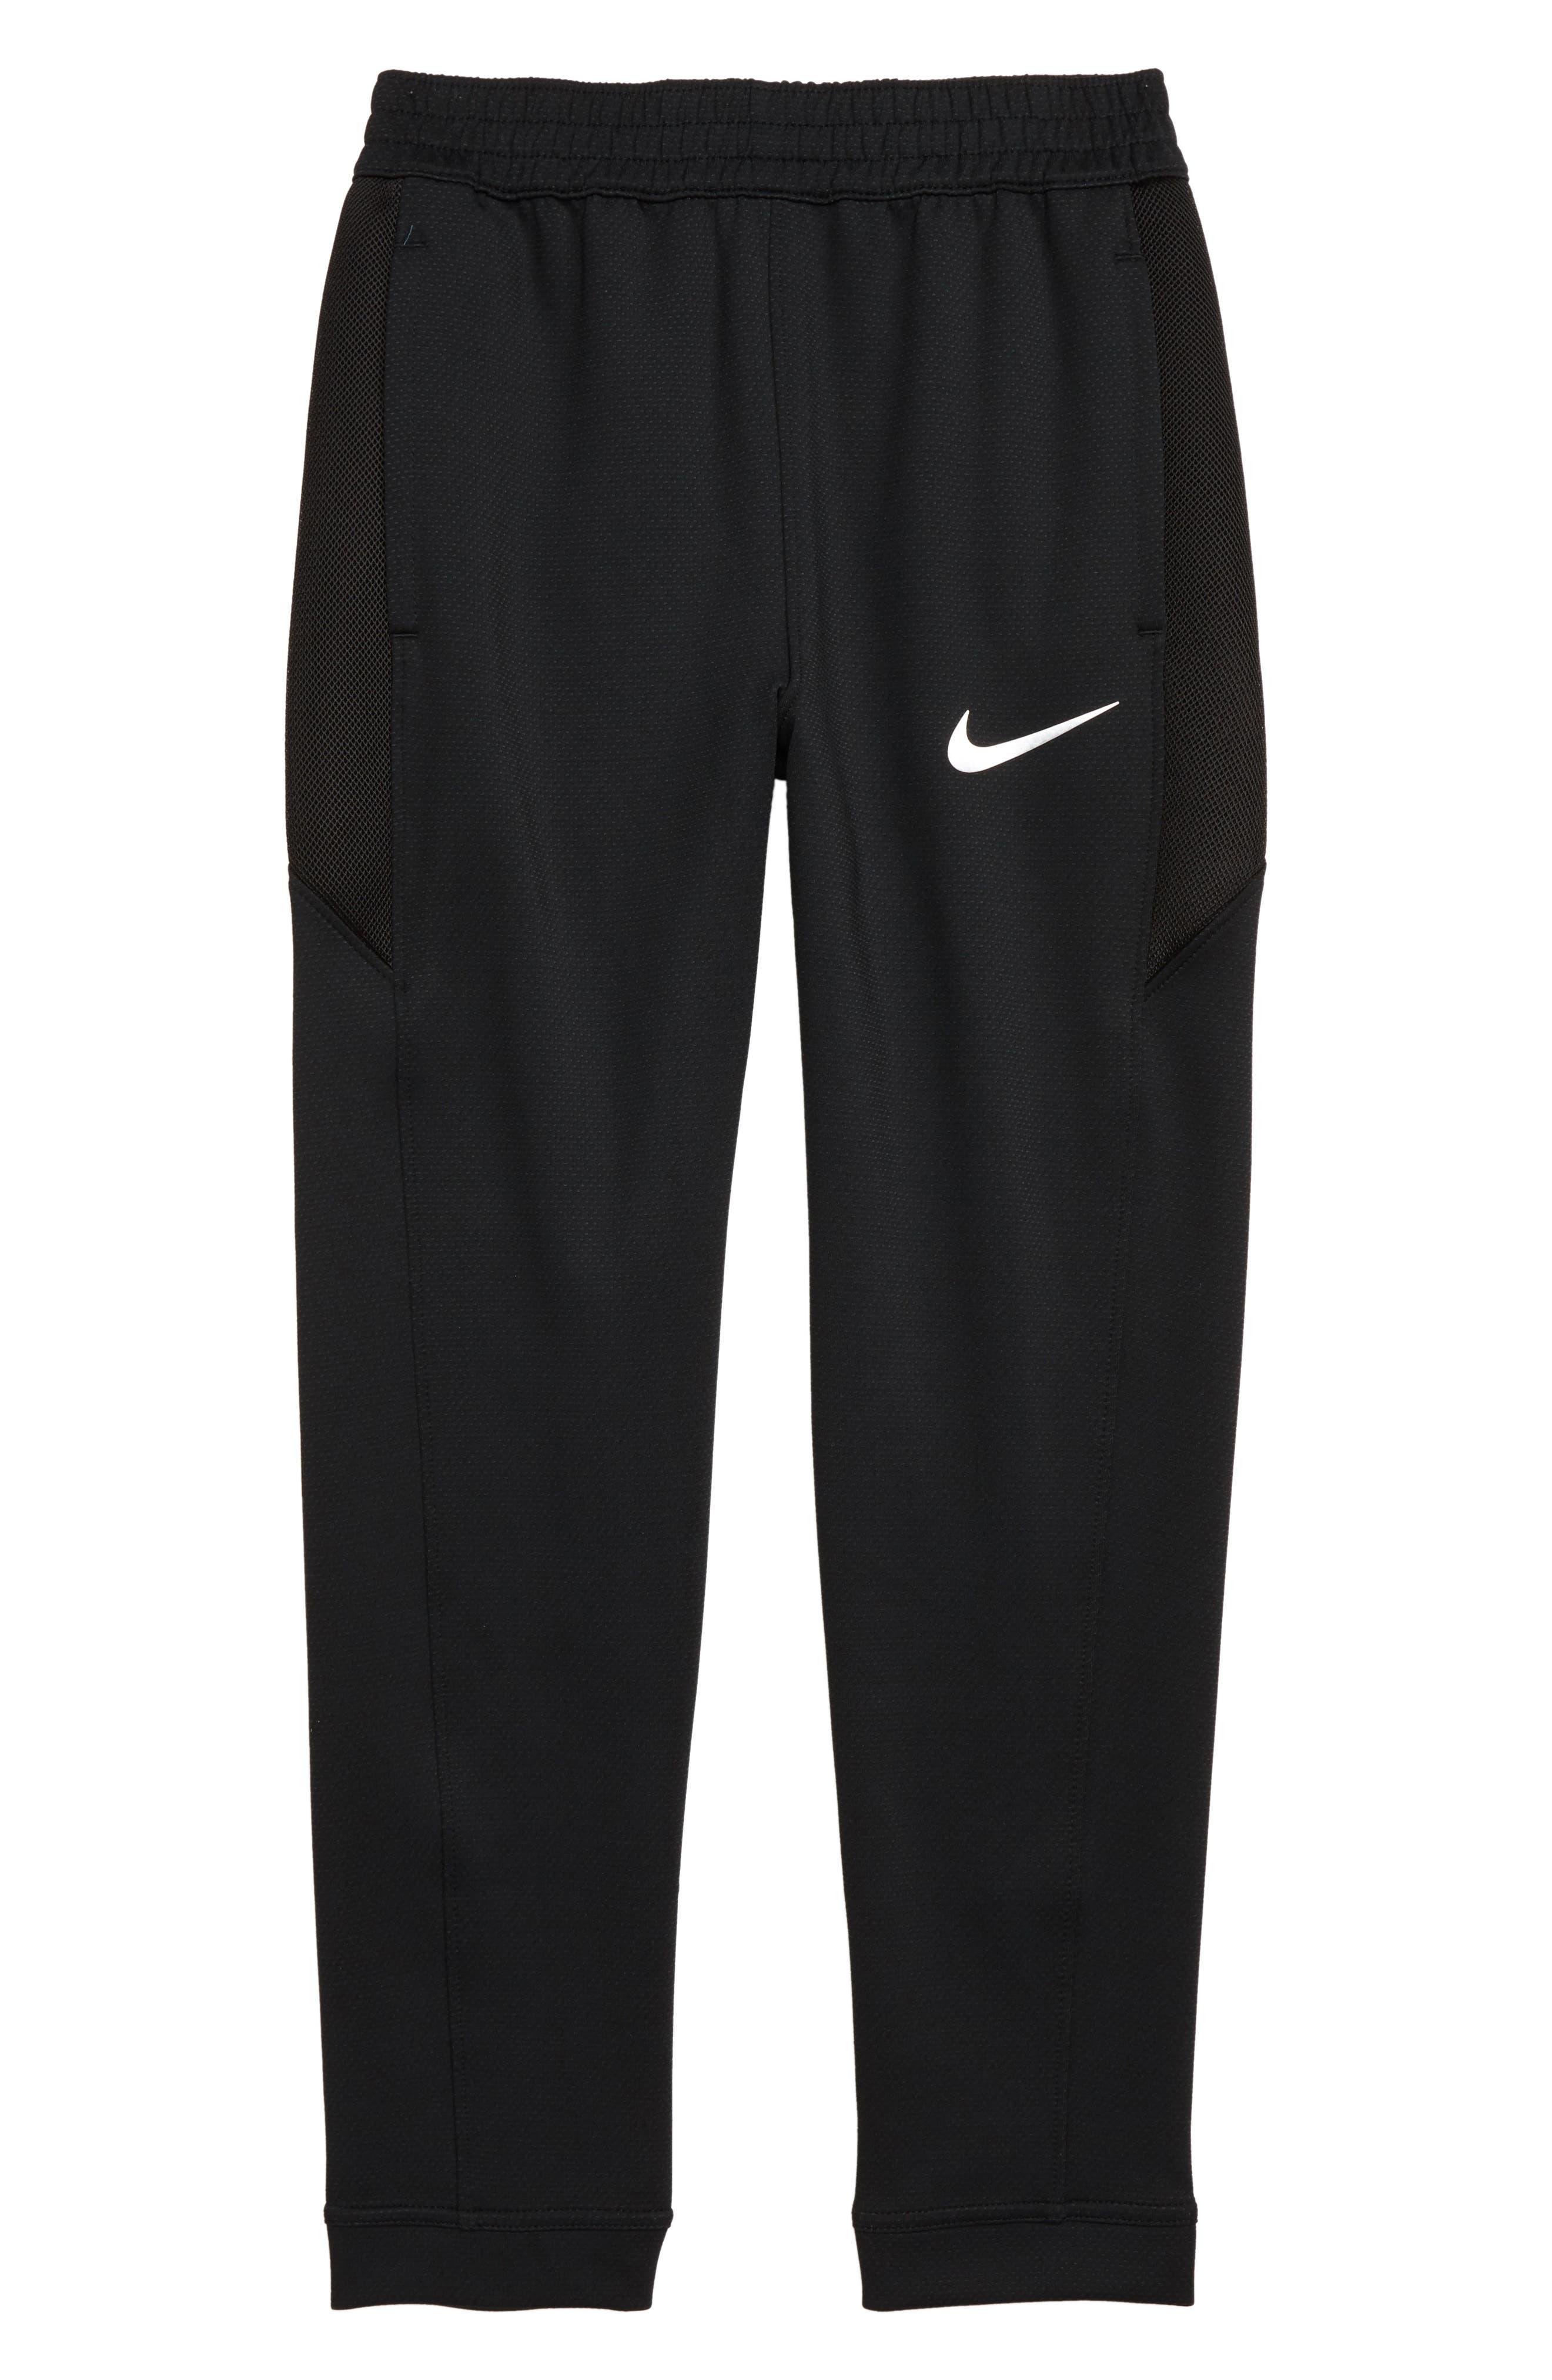 Dry Therma Flex Showtime Basketball Pants,                             Main thumbnail 1, color,                             BLACK/ METALLIC SILVER